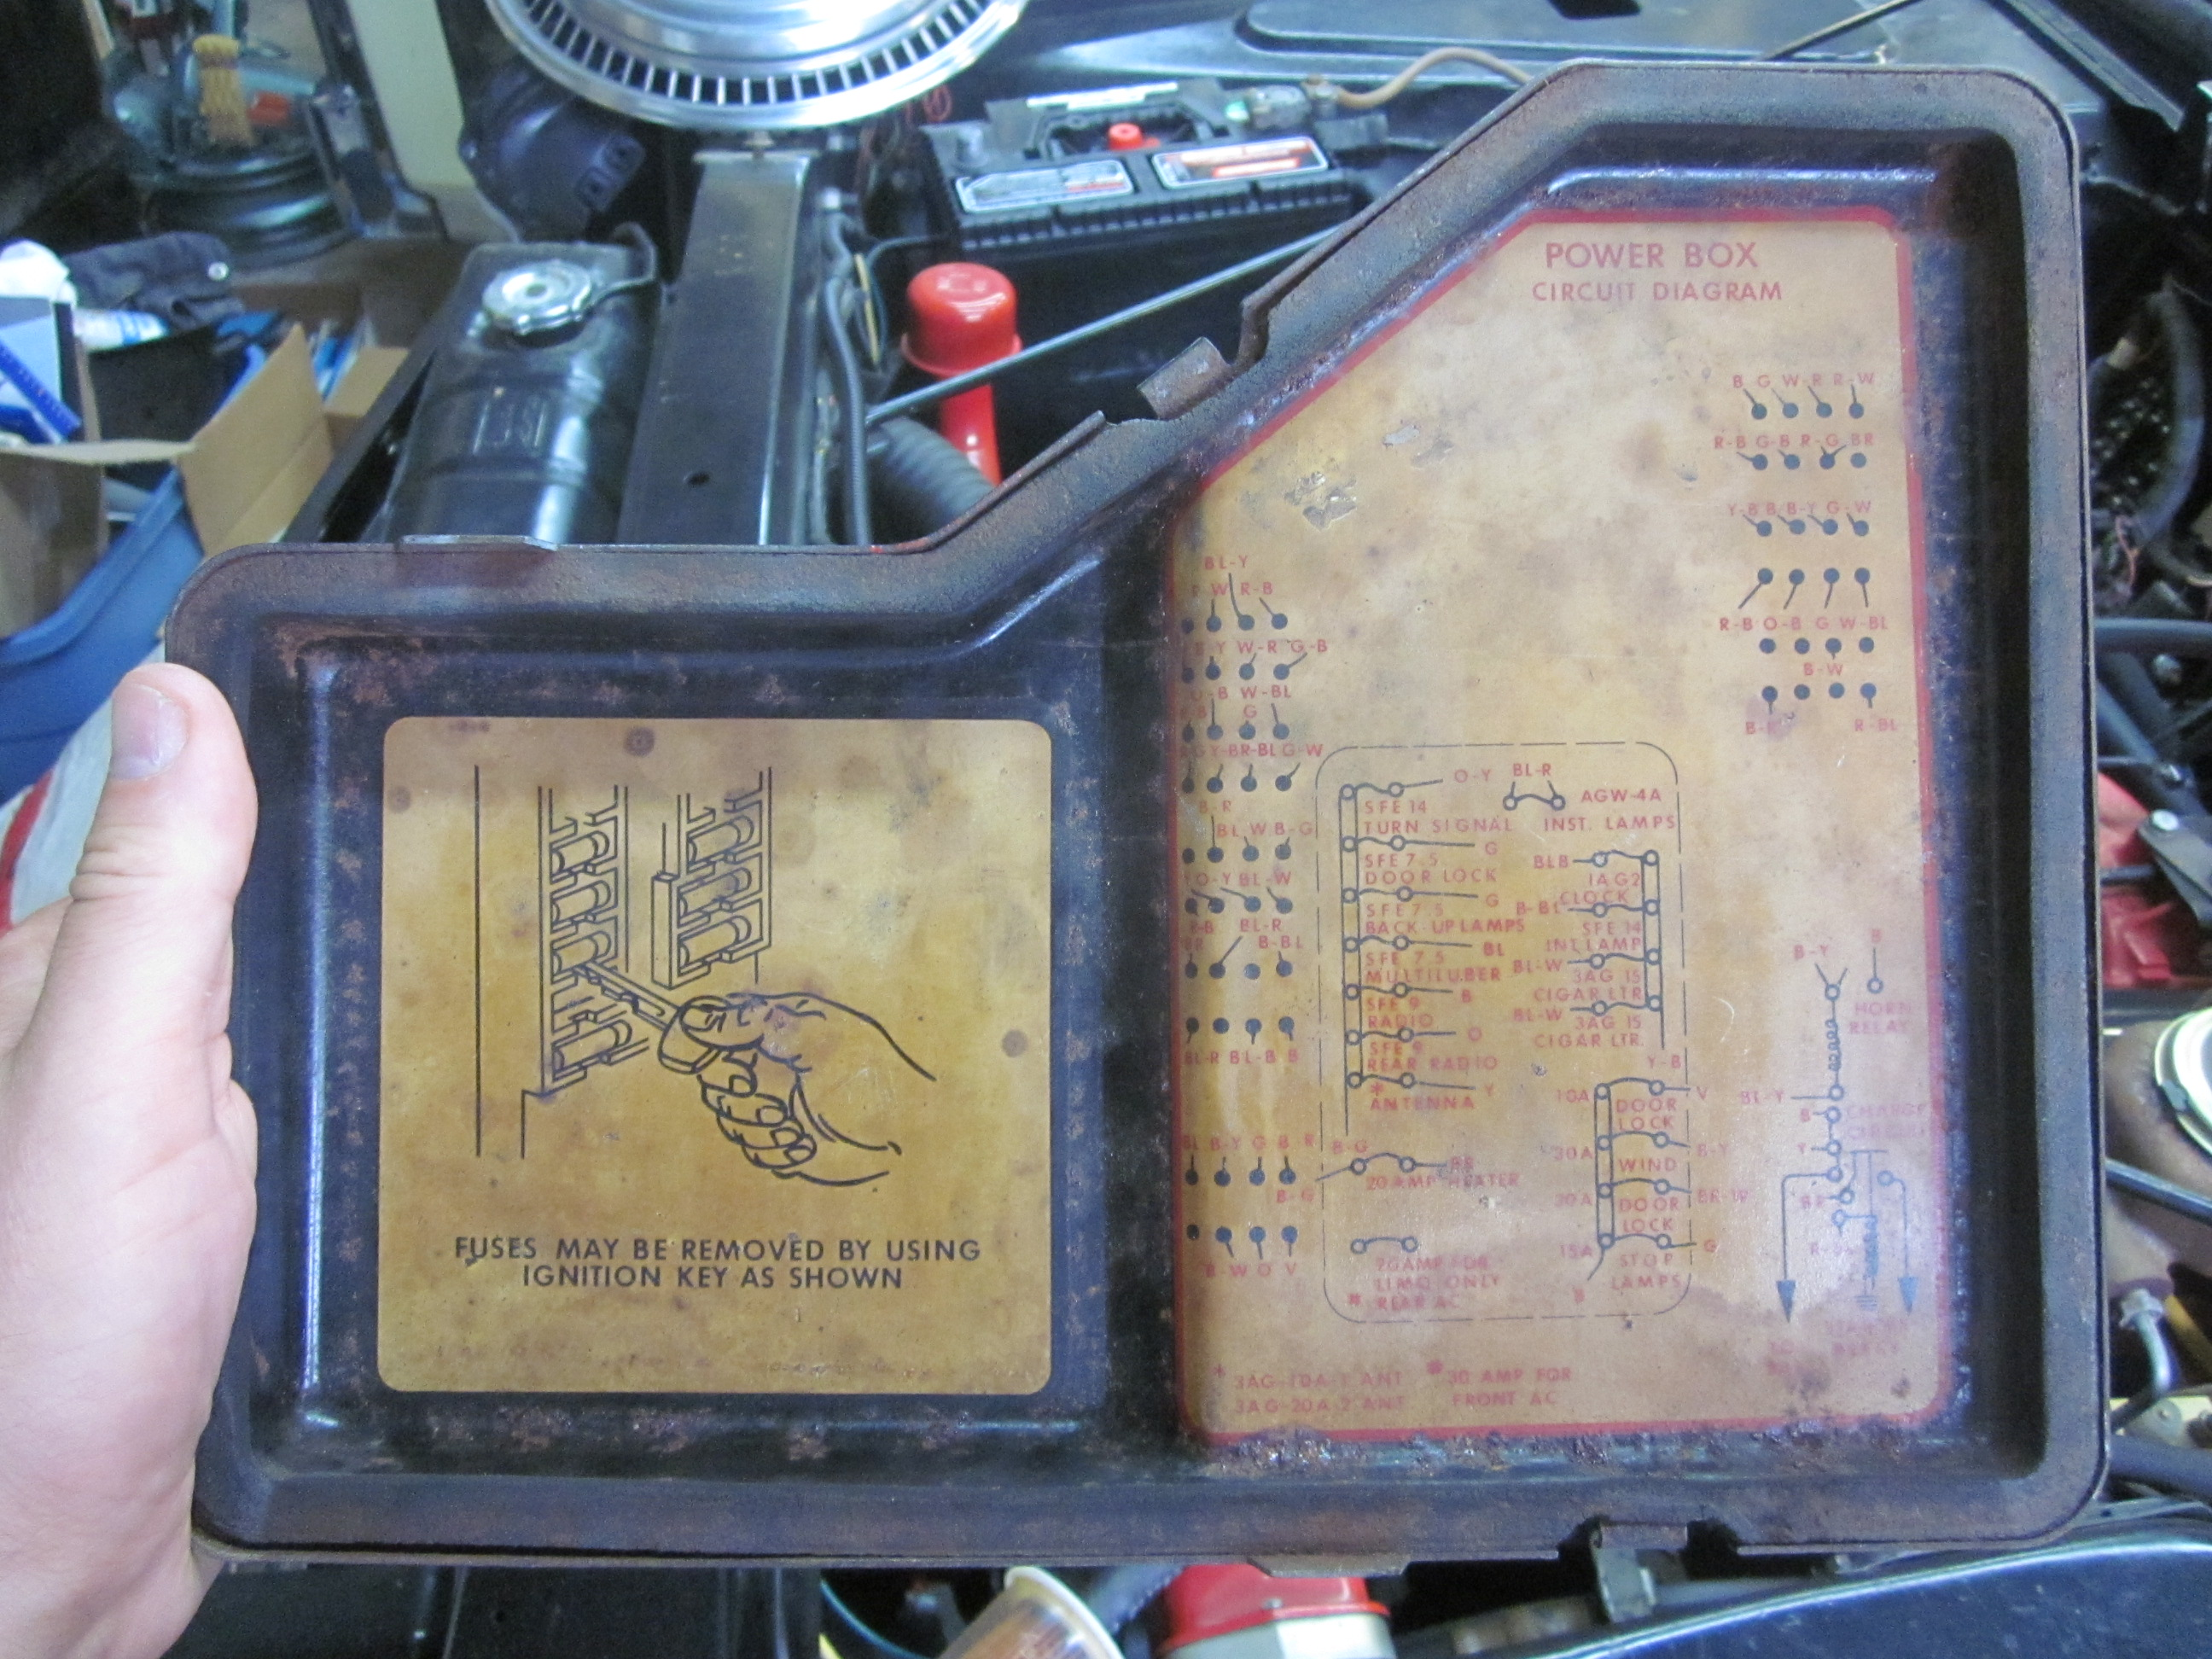 hight resolution of 1968 corvette fuse box wiring diagram1969 corvette fuse box location wiring diagram database1969 corvette fuse box